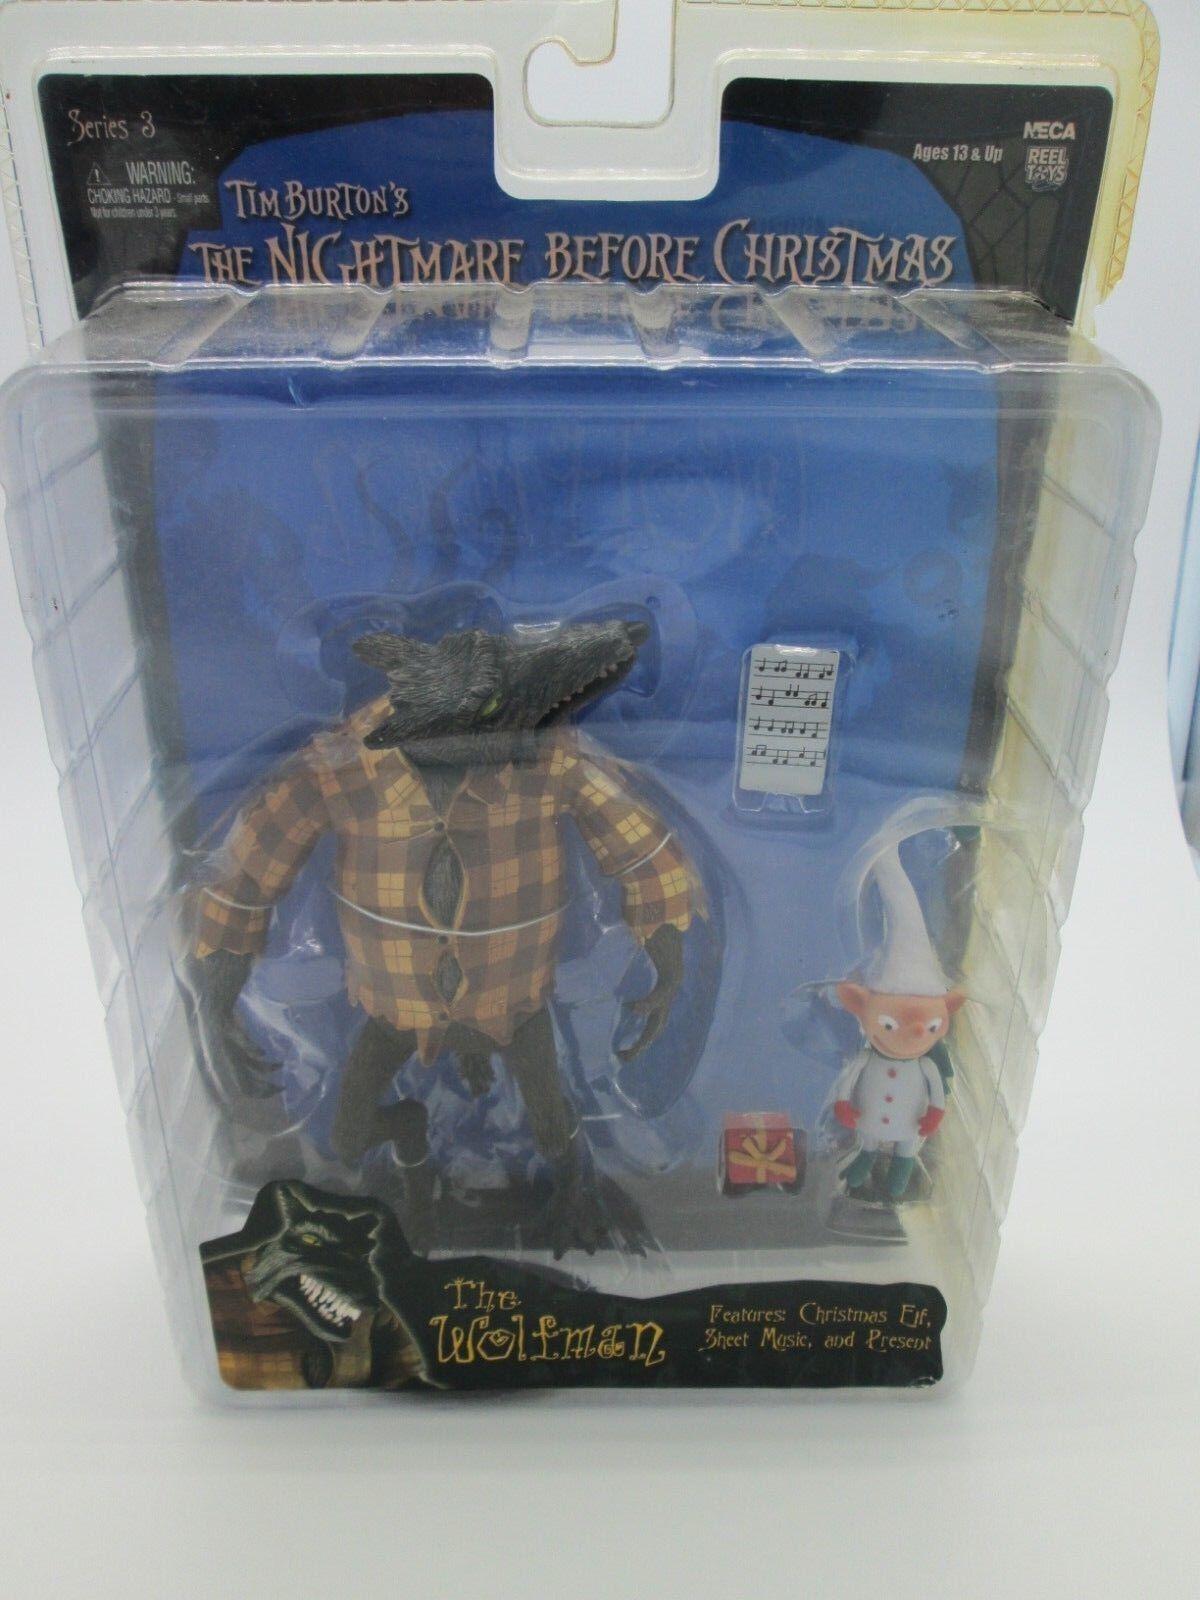 NECA Series 3 - The Nightmare Before Christmas Wolfman Figure Tim Burton toy